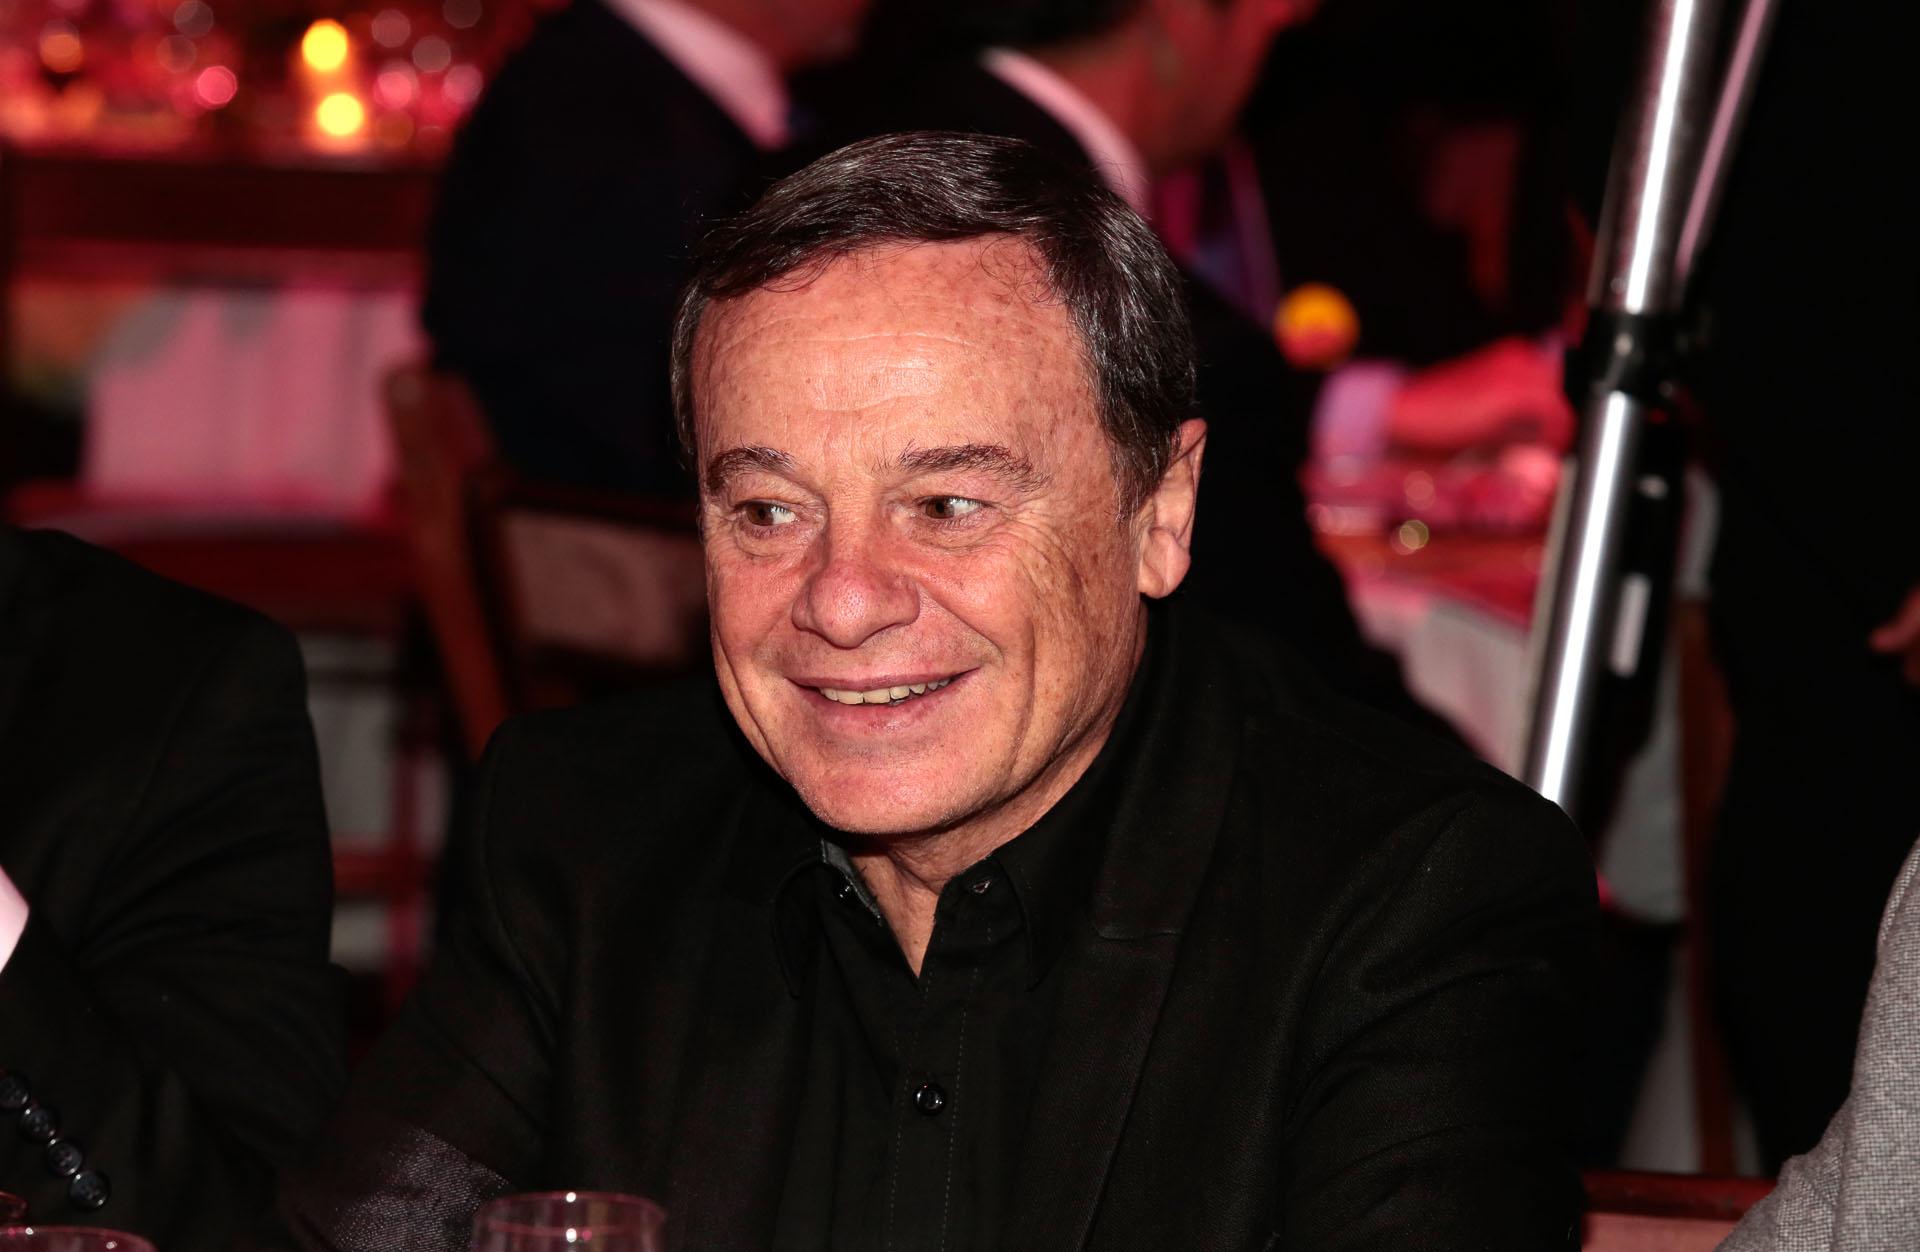 Pablo Codevila